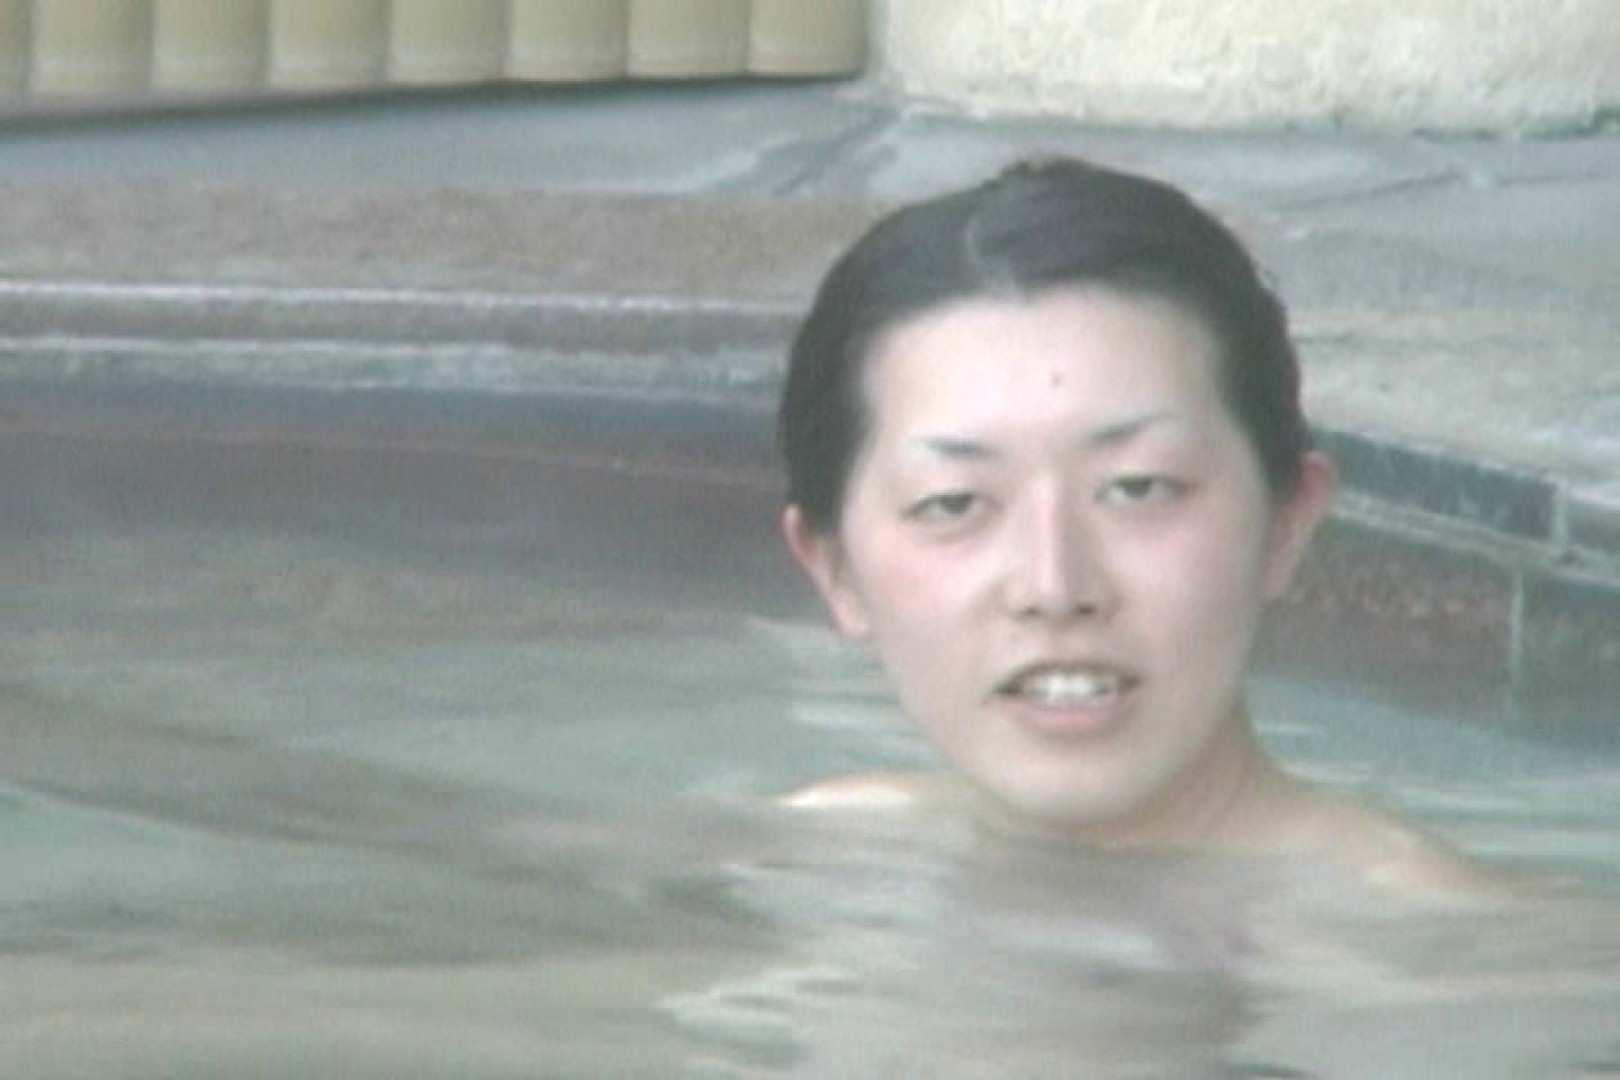 Aquaな露天風呂Vol.589 盗撮 | HなOL  105pic 27